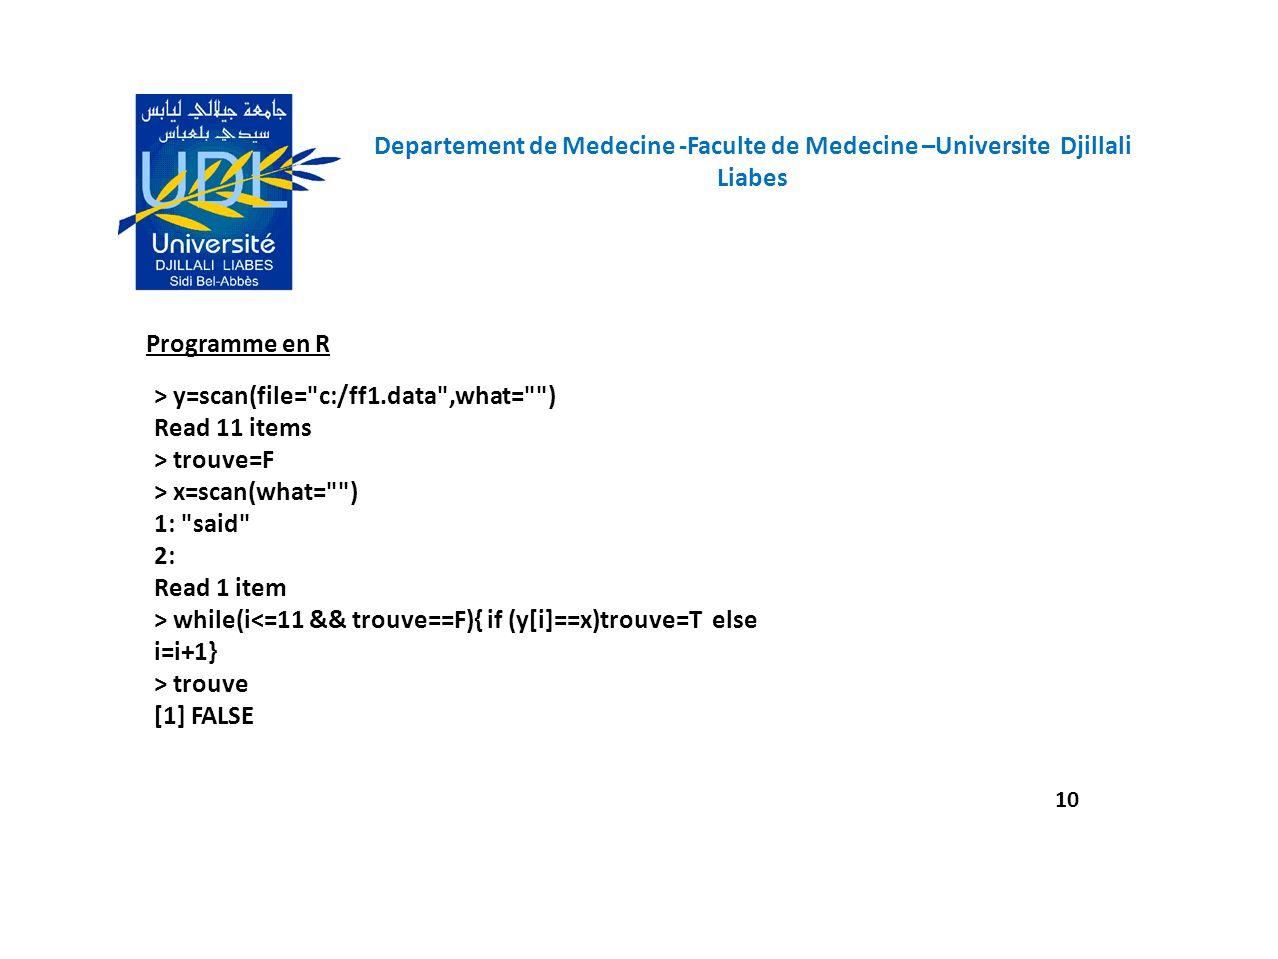 Departement de Medecine -Faculte de Medecine –Universite Djillali Liabes 10 Programme en R > y=scan(file=